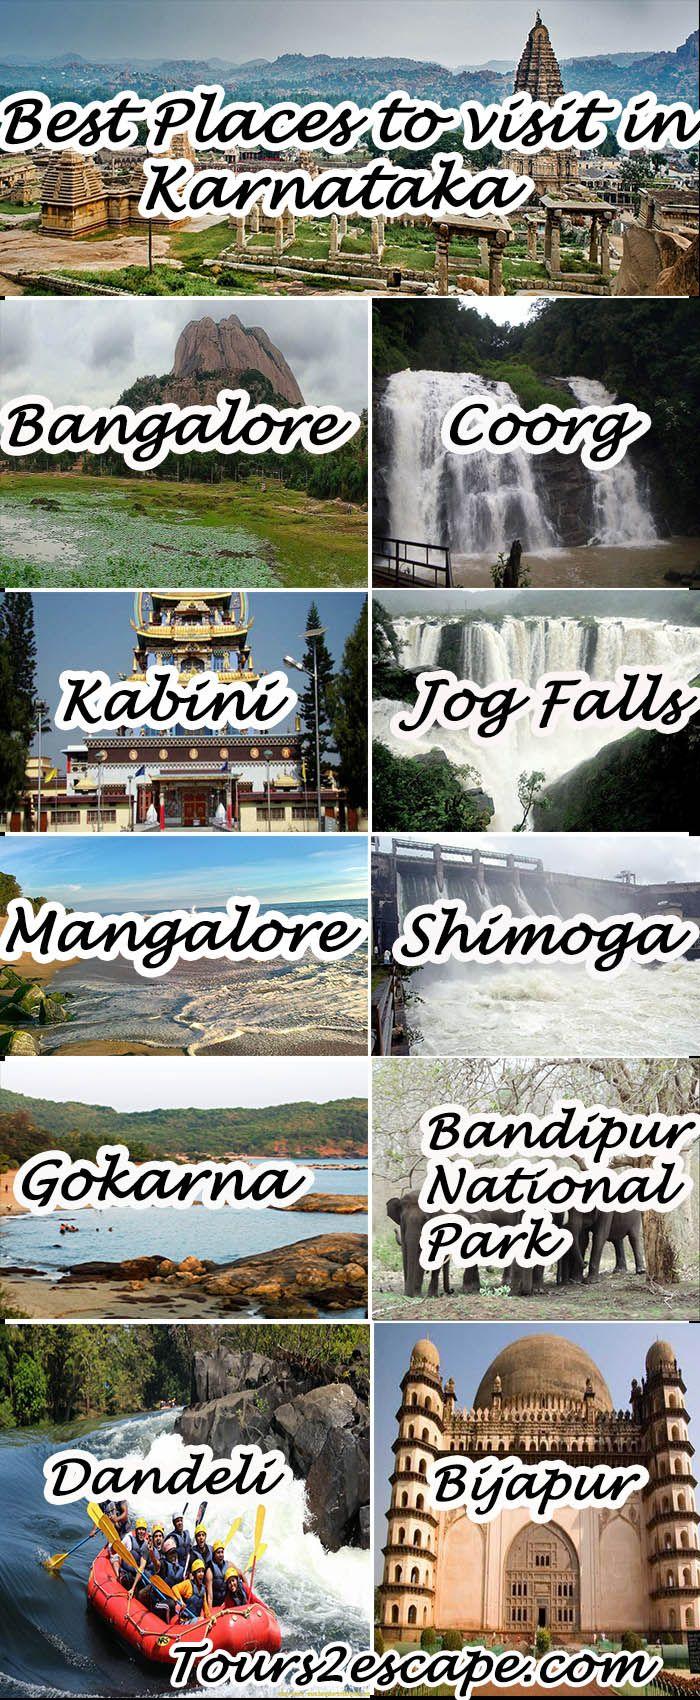 10 Best places in Karnataka  #banglore #coorg #kabini #jogfalls #mangalore #shimoga #gokarna #BandipurNationalPark #Dandeli #Bijapur  http://www.tours2escape.com/10-best-places-in-karnataka/